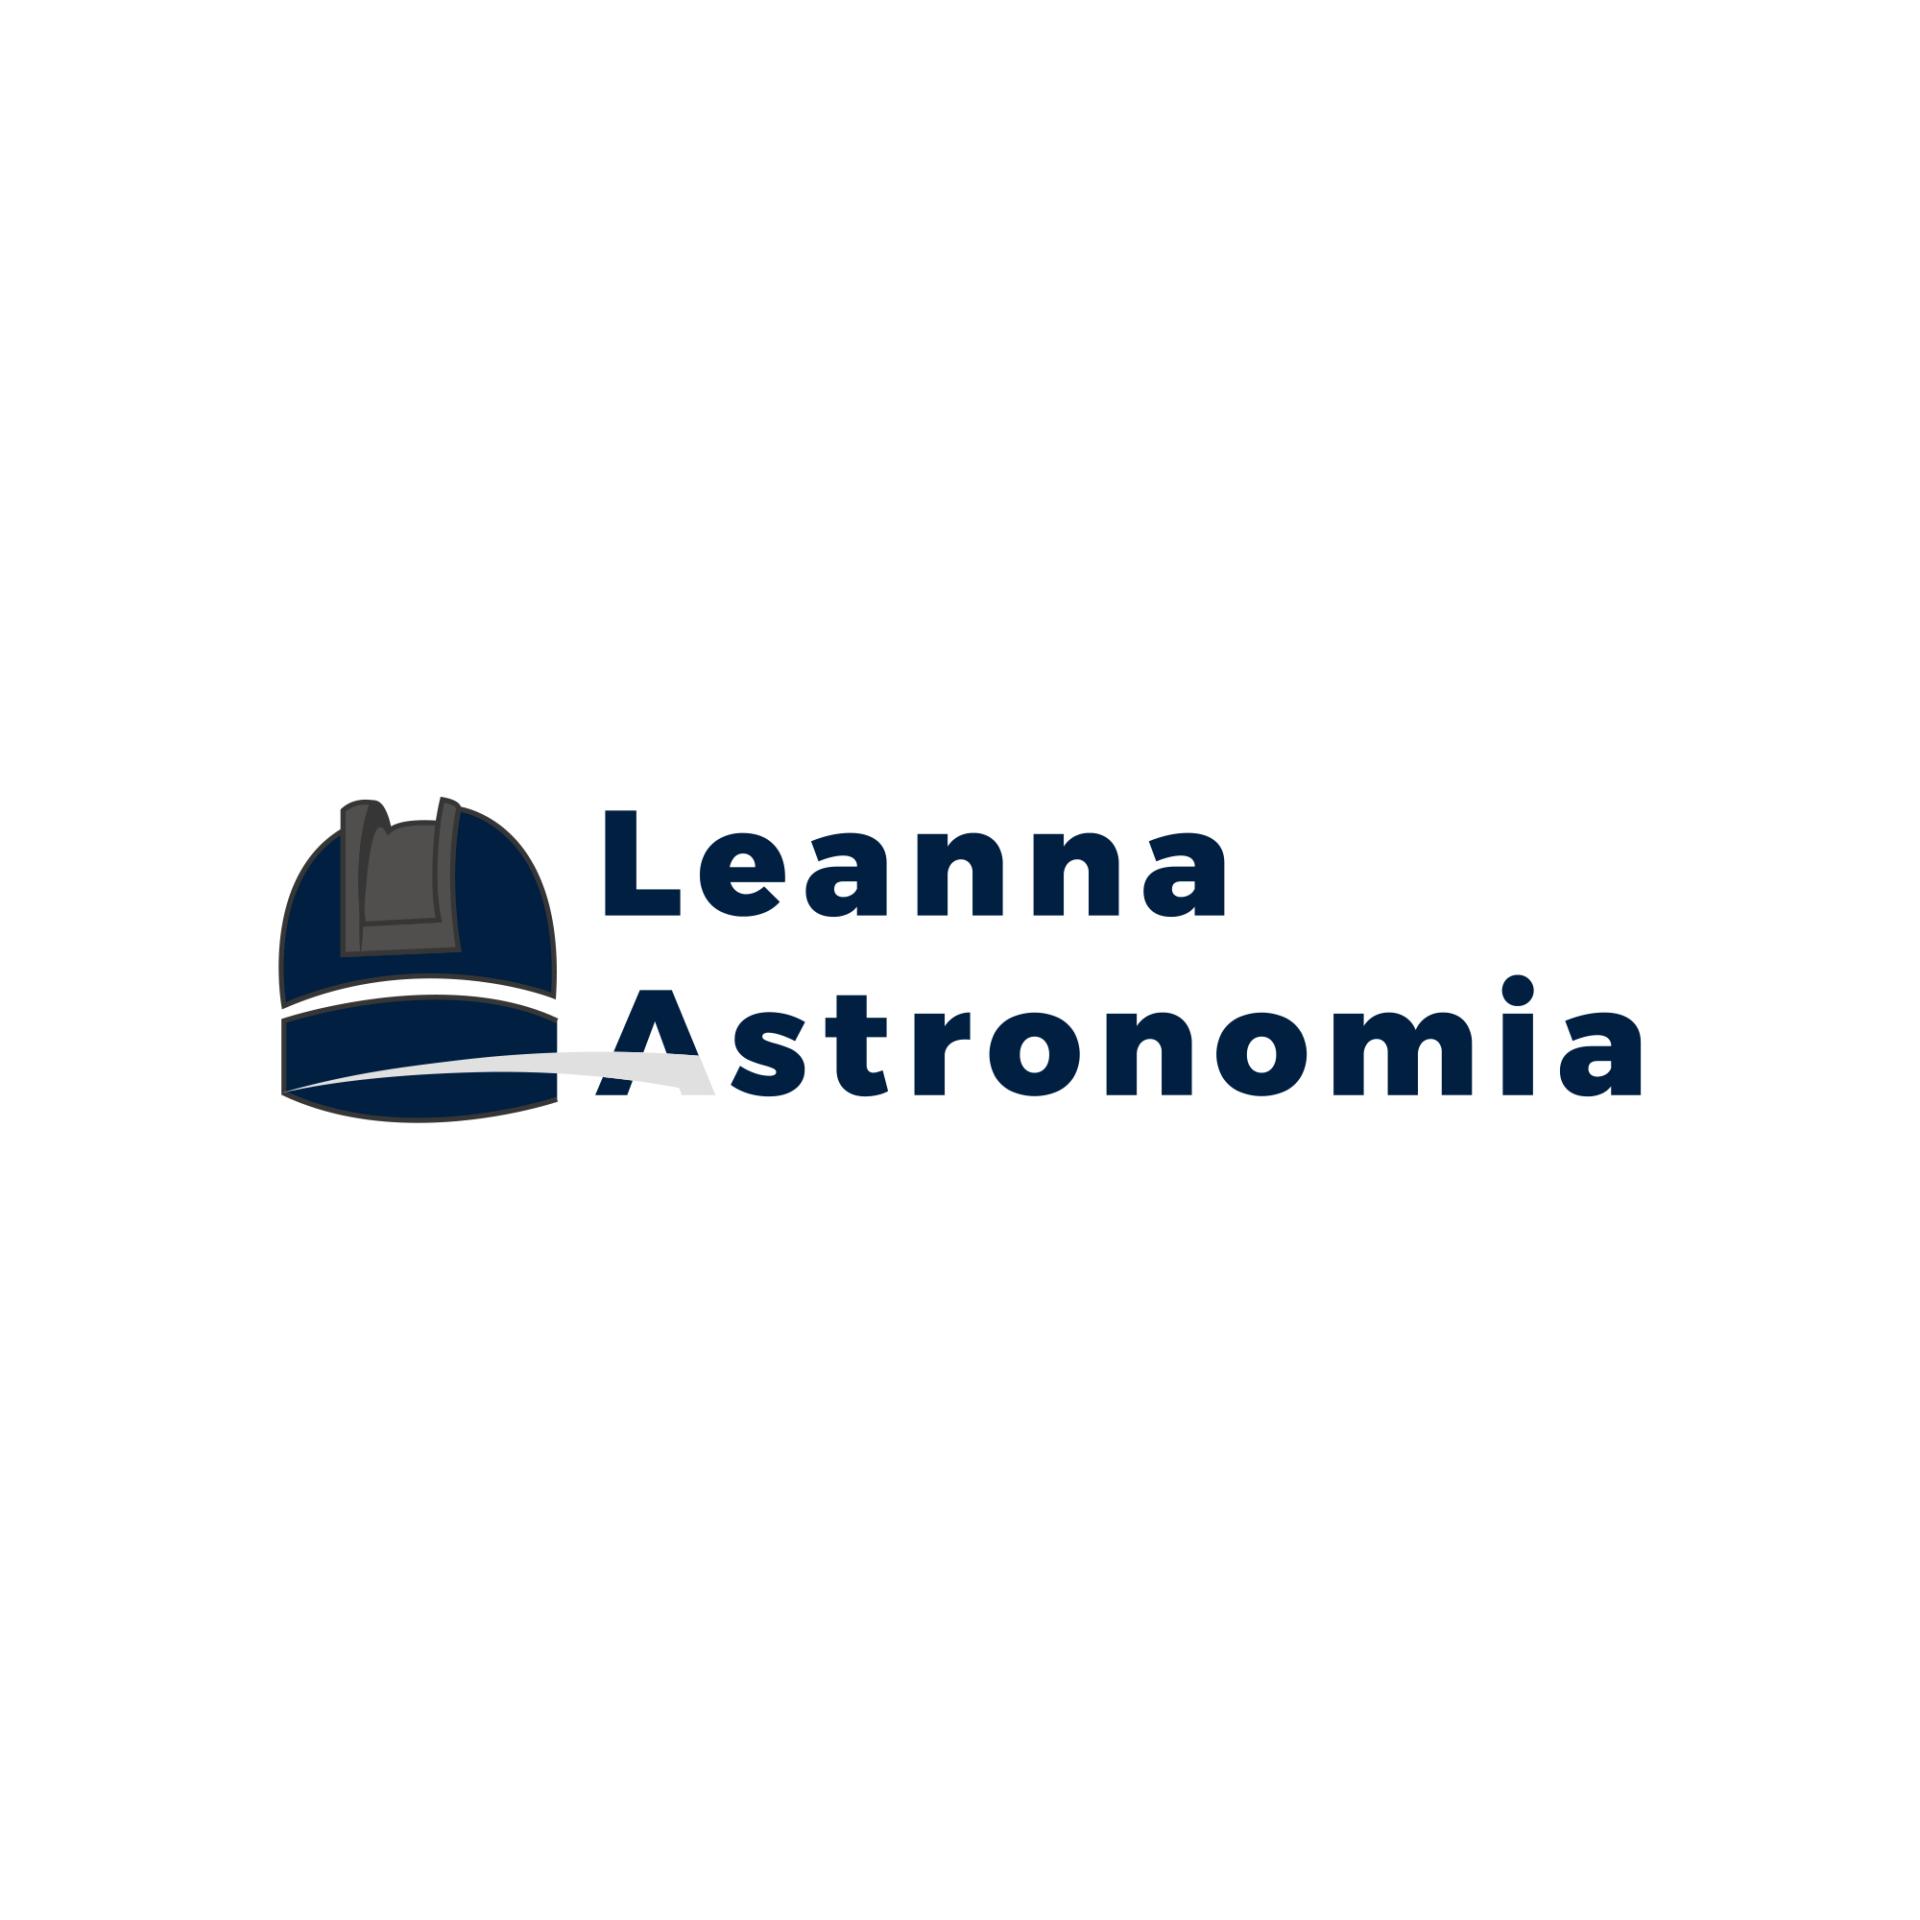 Leanna Astronomia